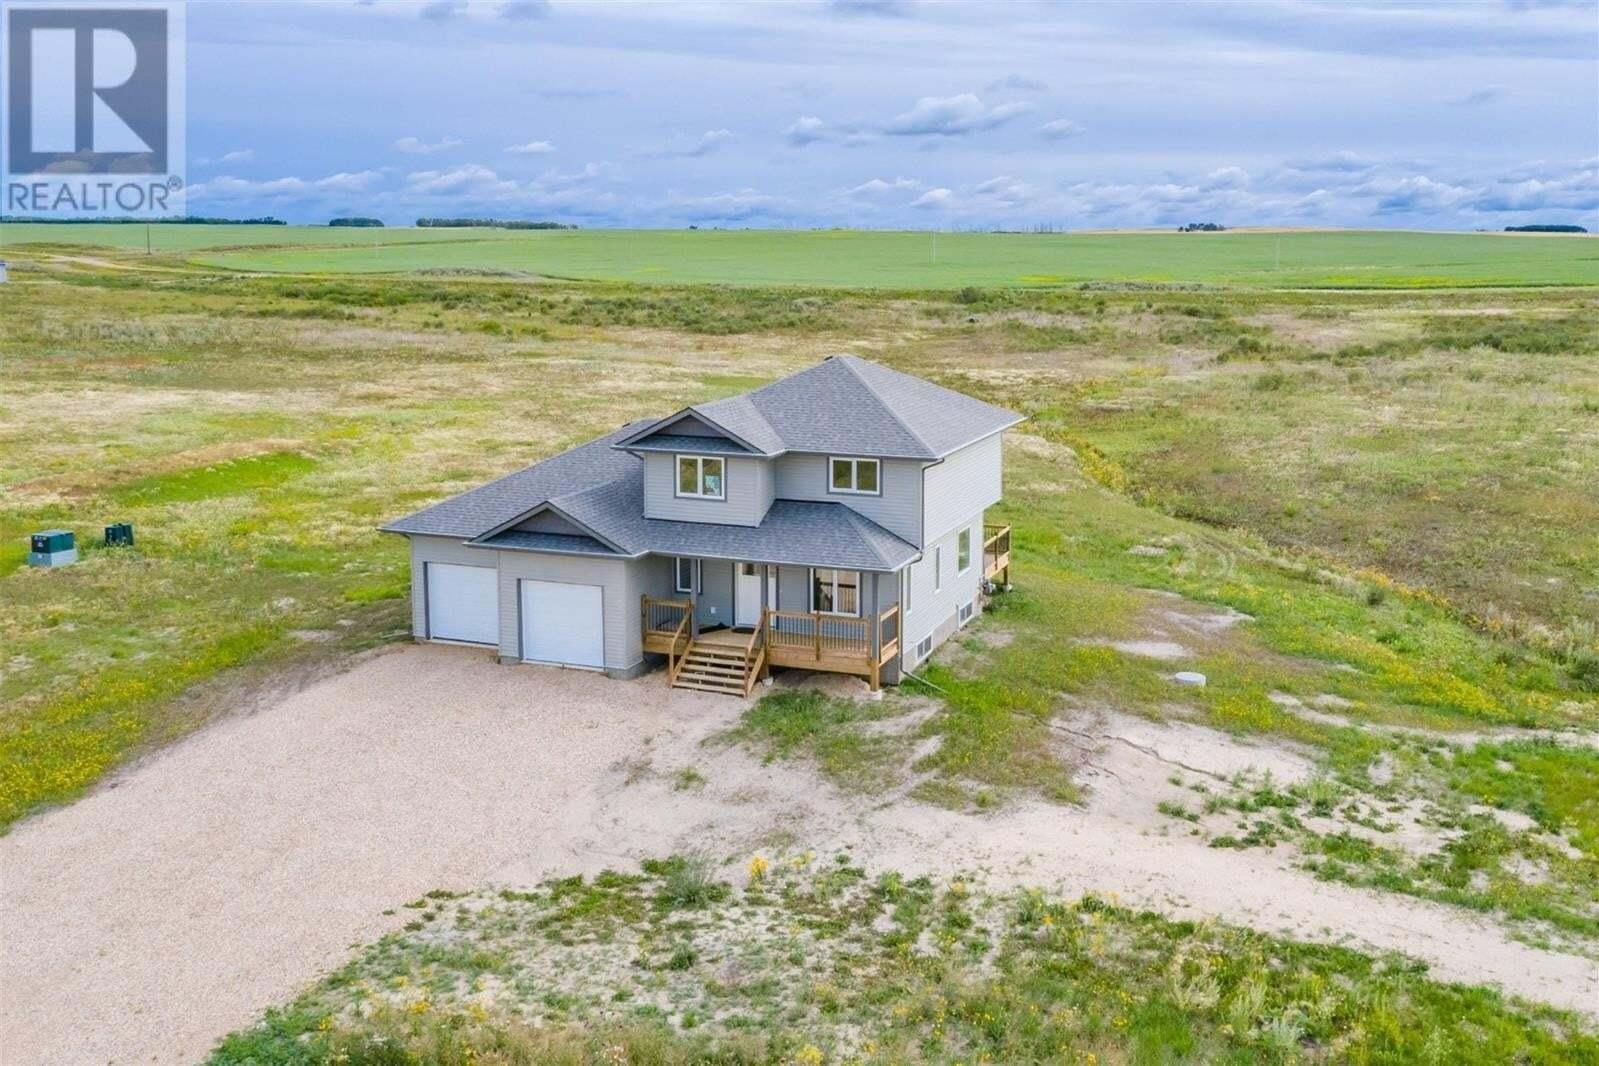 House for sale at 66 Meadowlark Cres Blucher Rm No. 343 Saskatchewan - MLS: SK813898